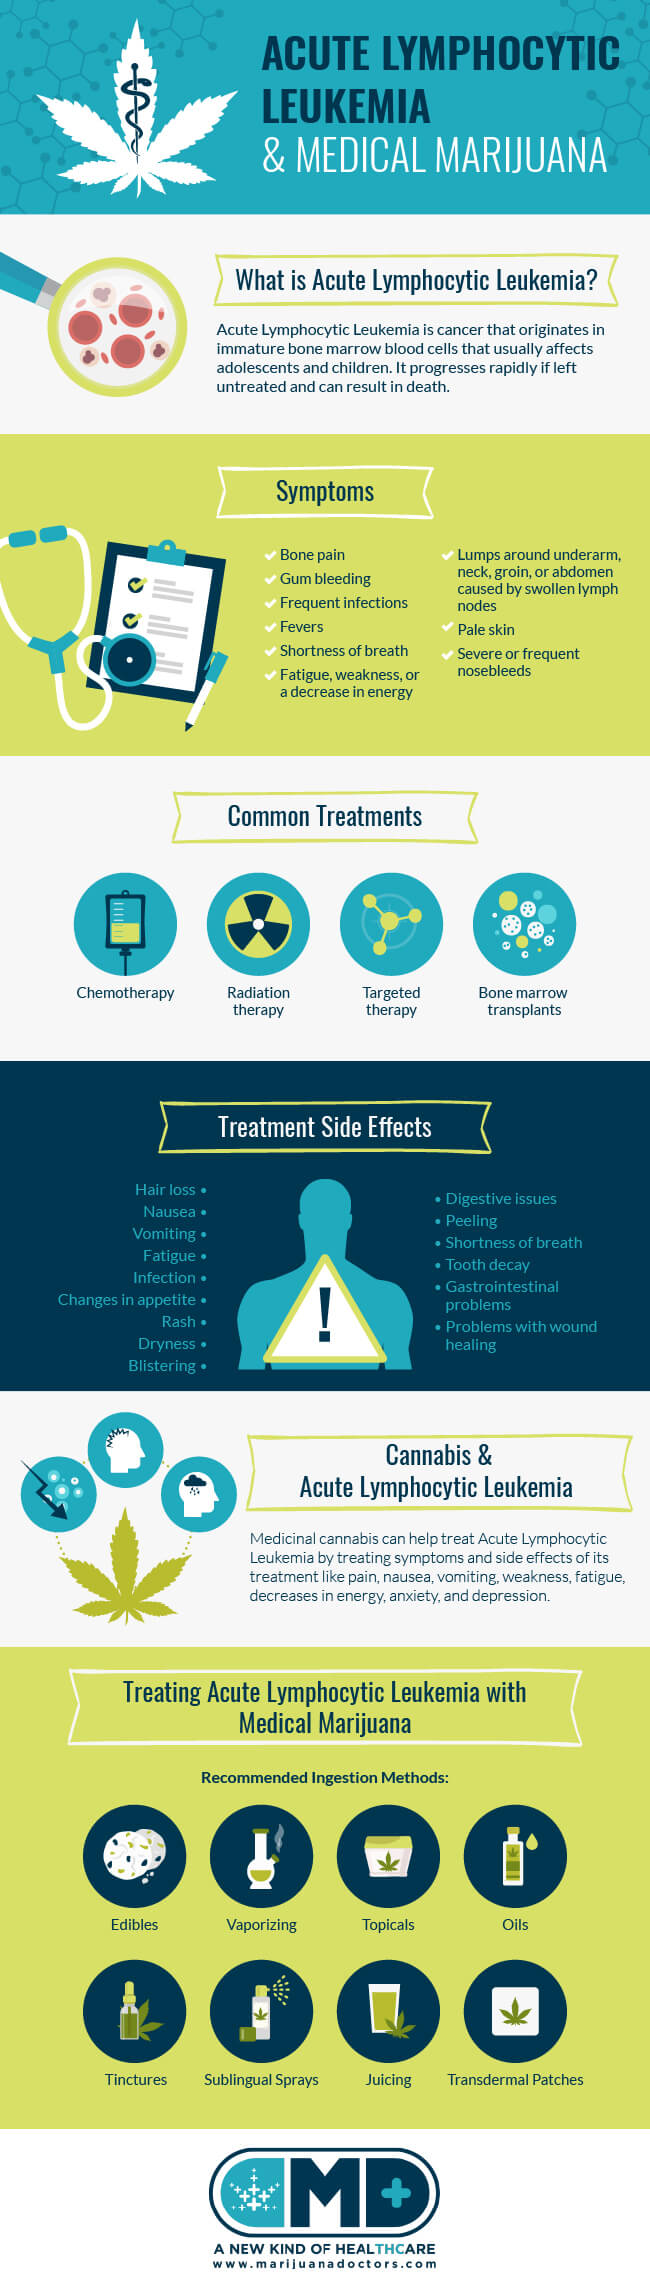 Acute Lymphocytic Leukemia and Medical Marijuana